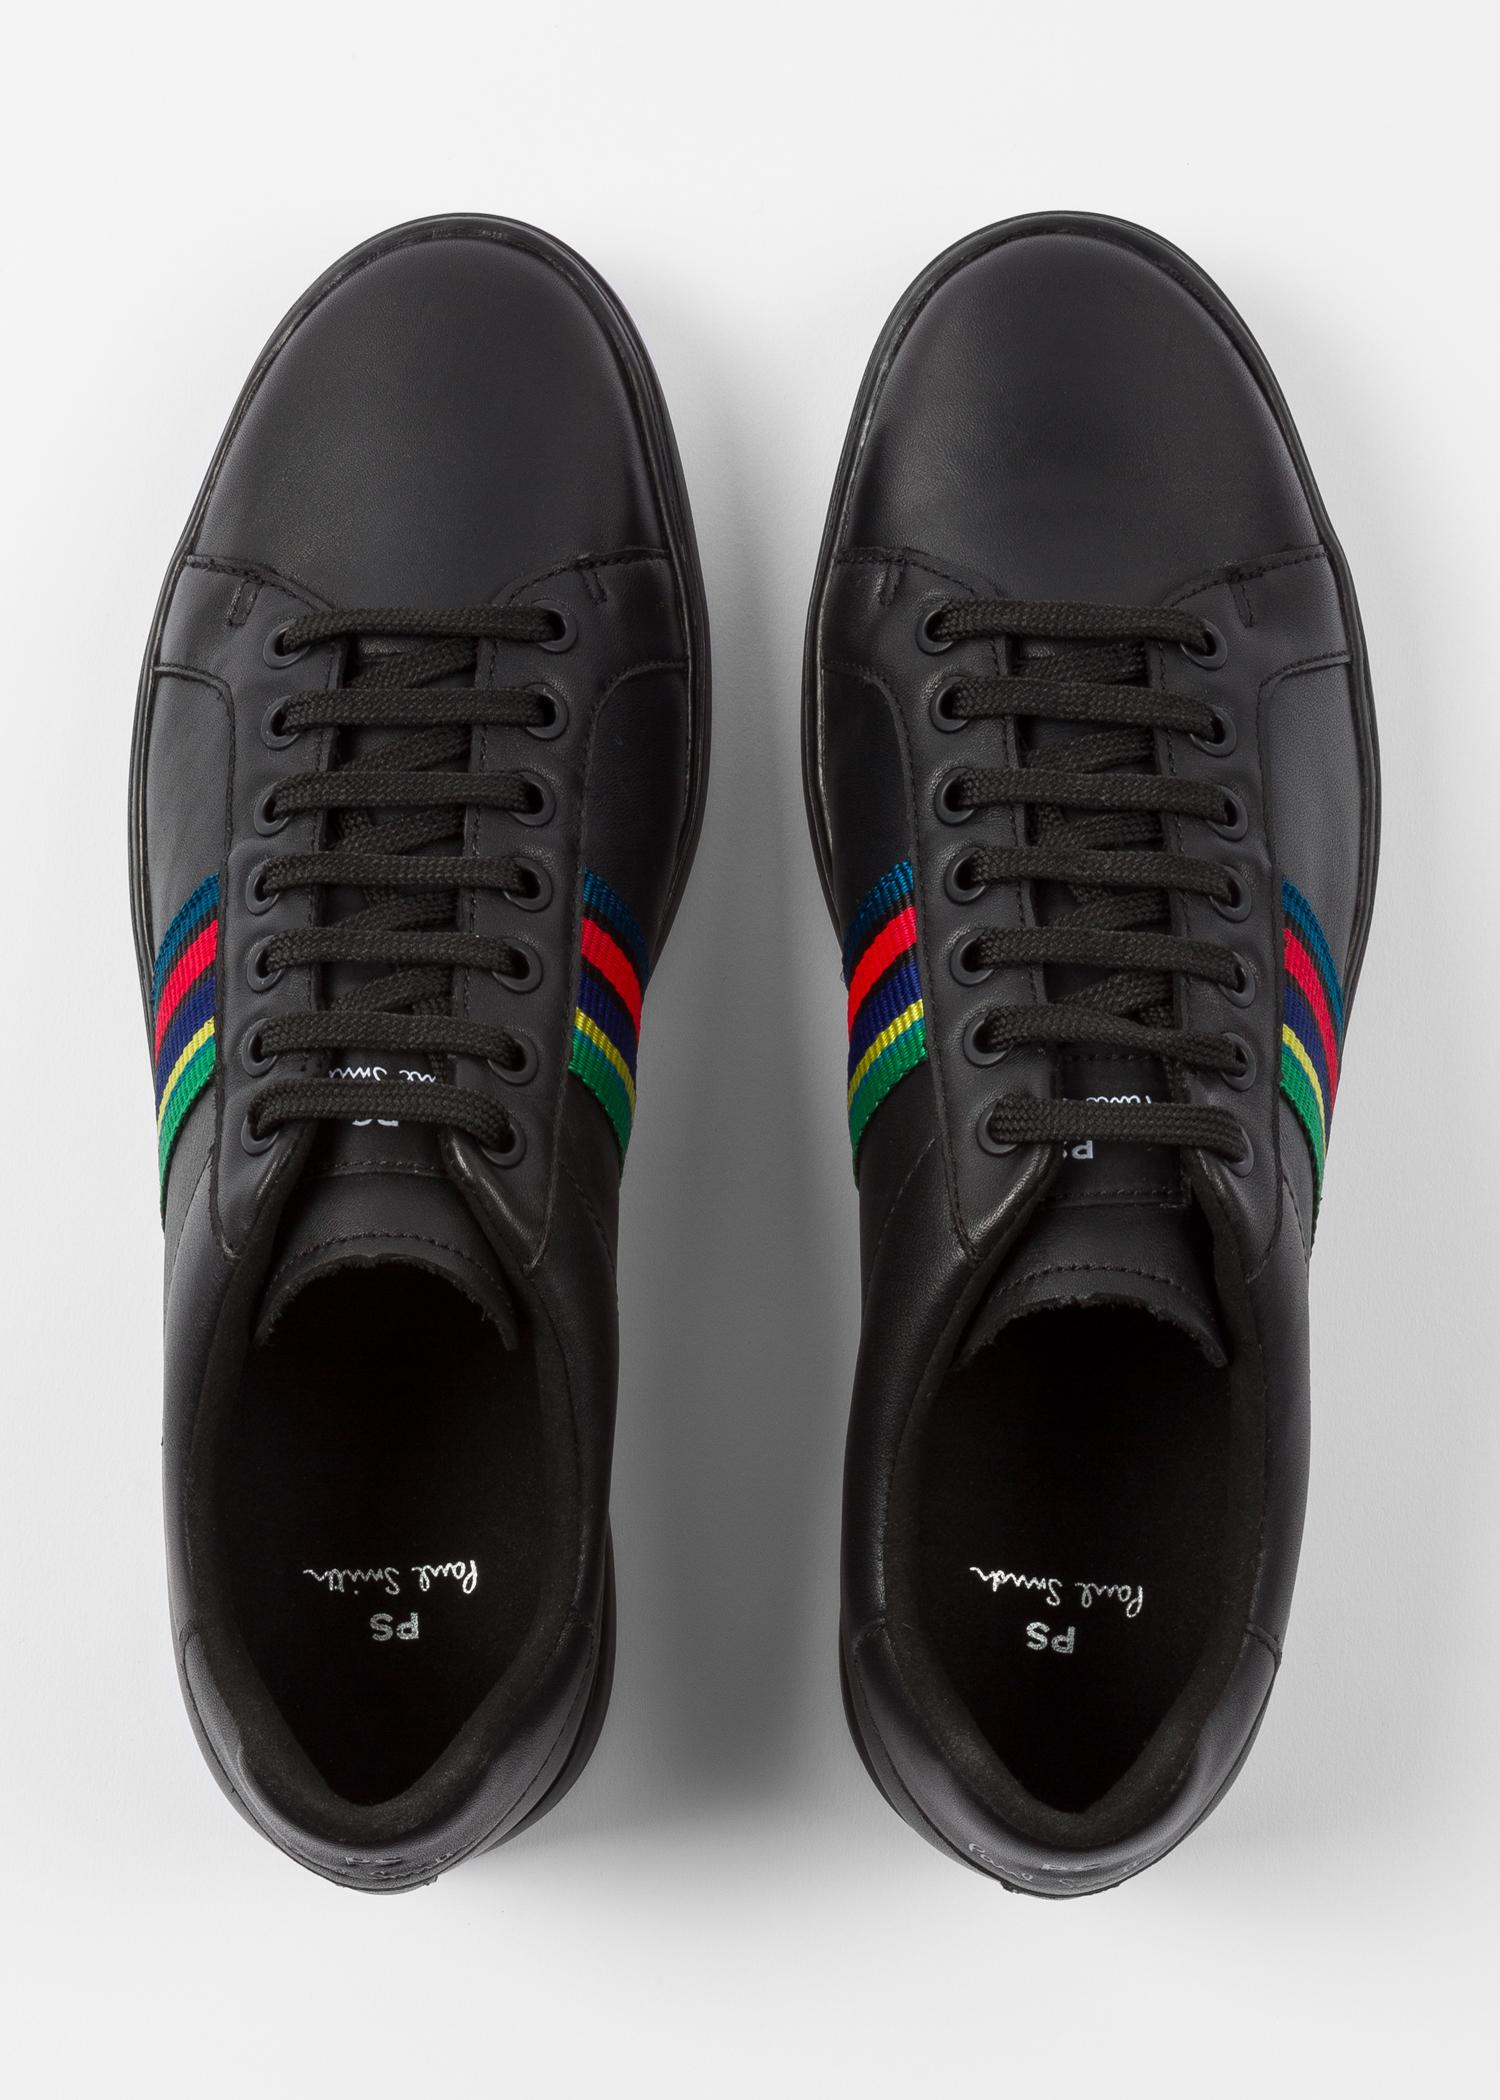 445809789c Men's Black Calf Leather 'Lapin' Trainers